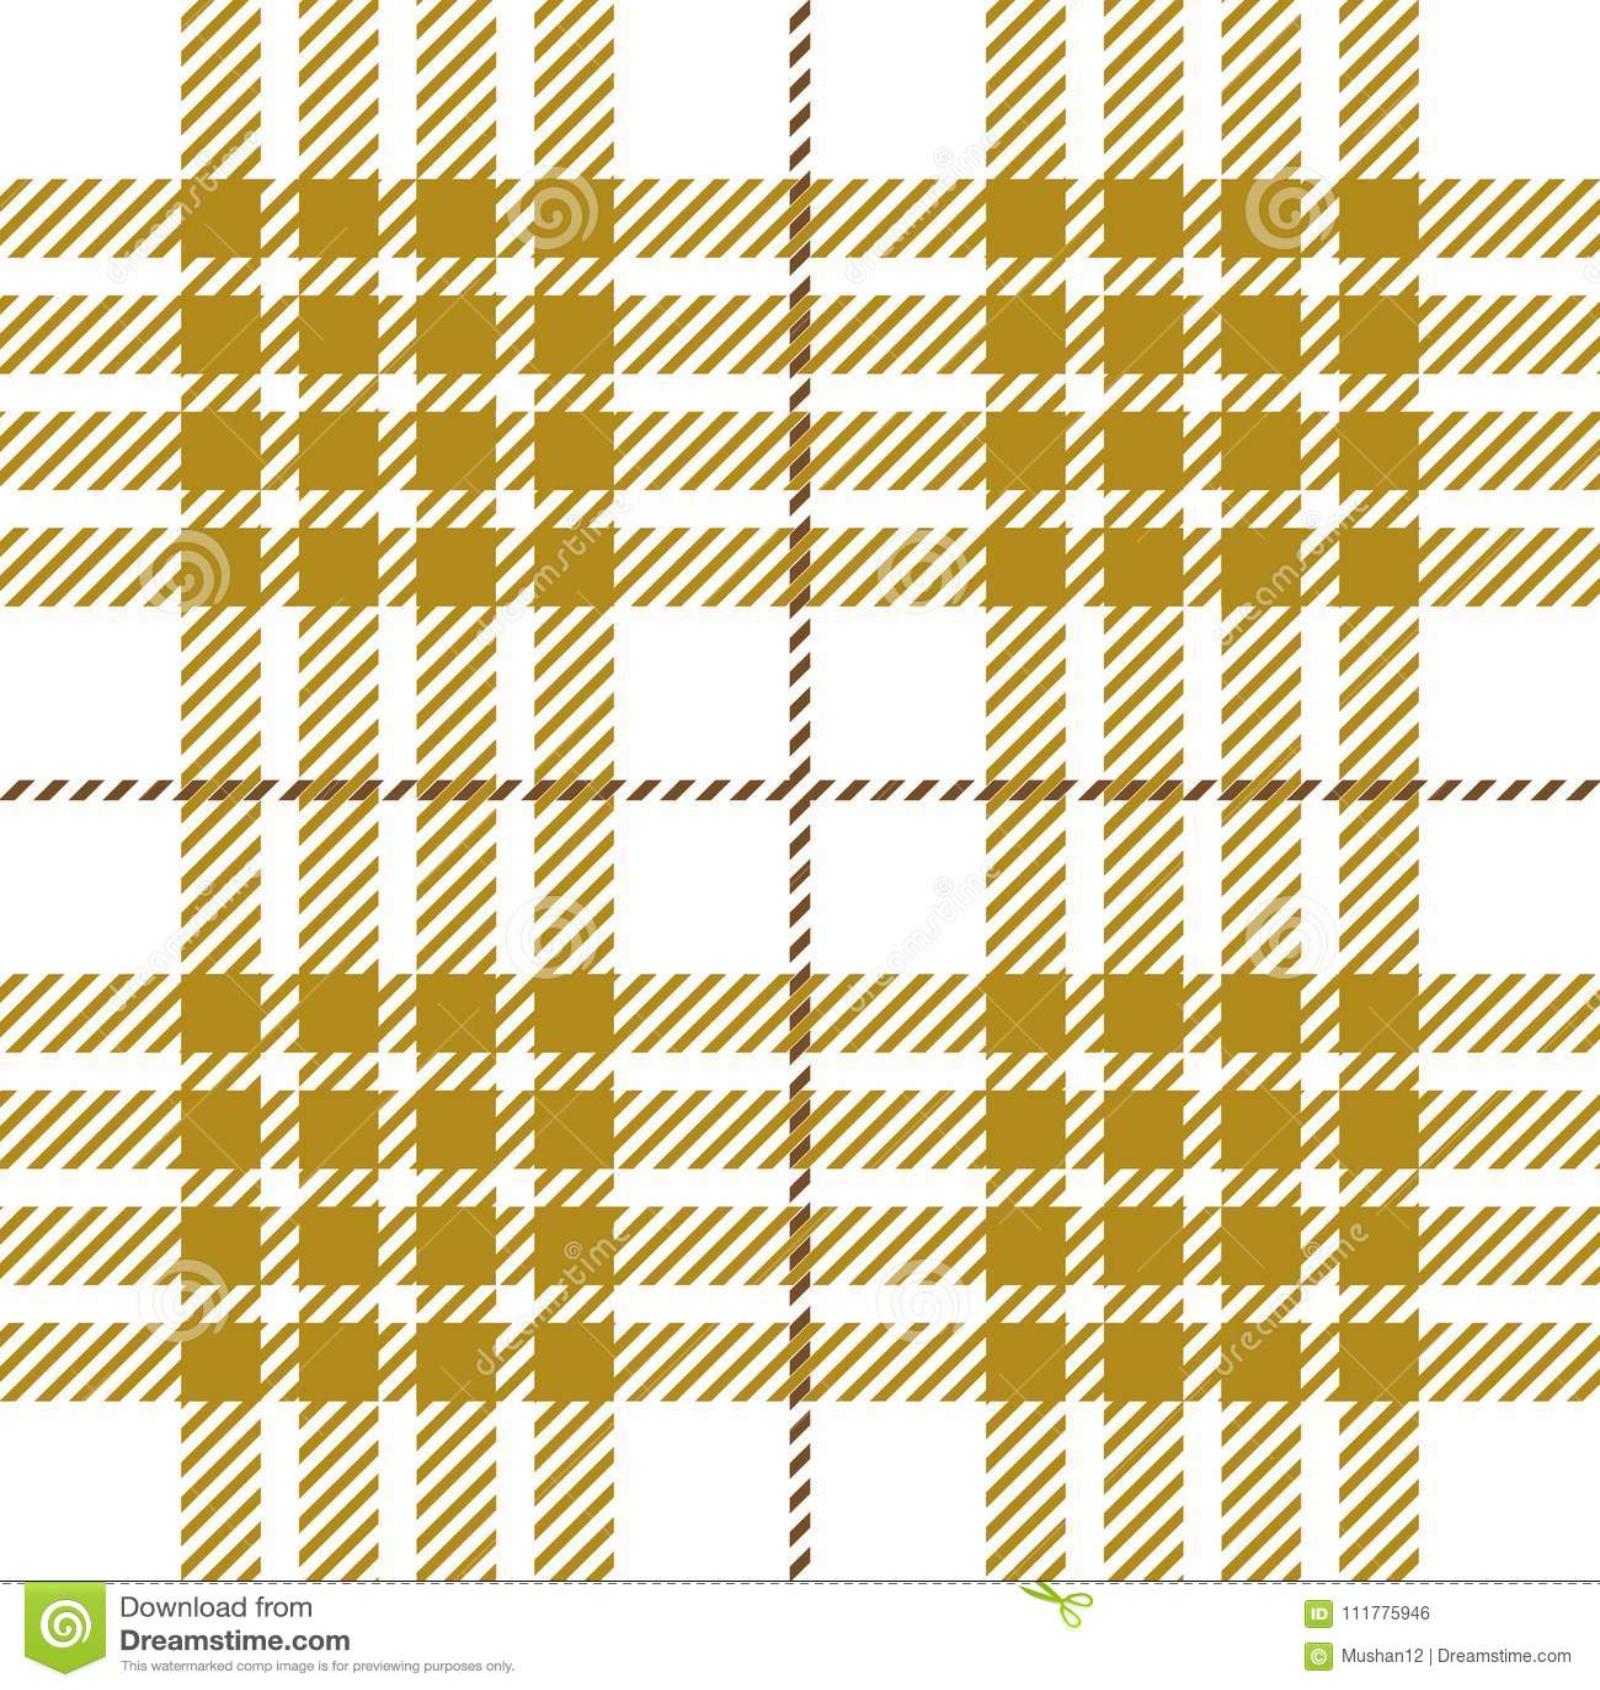 Goldenrod Tartan Plaid Seamless Pattern Design